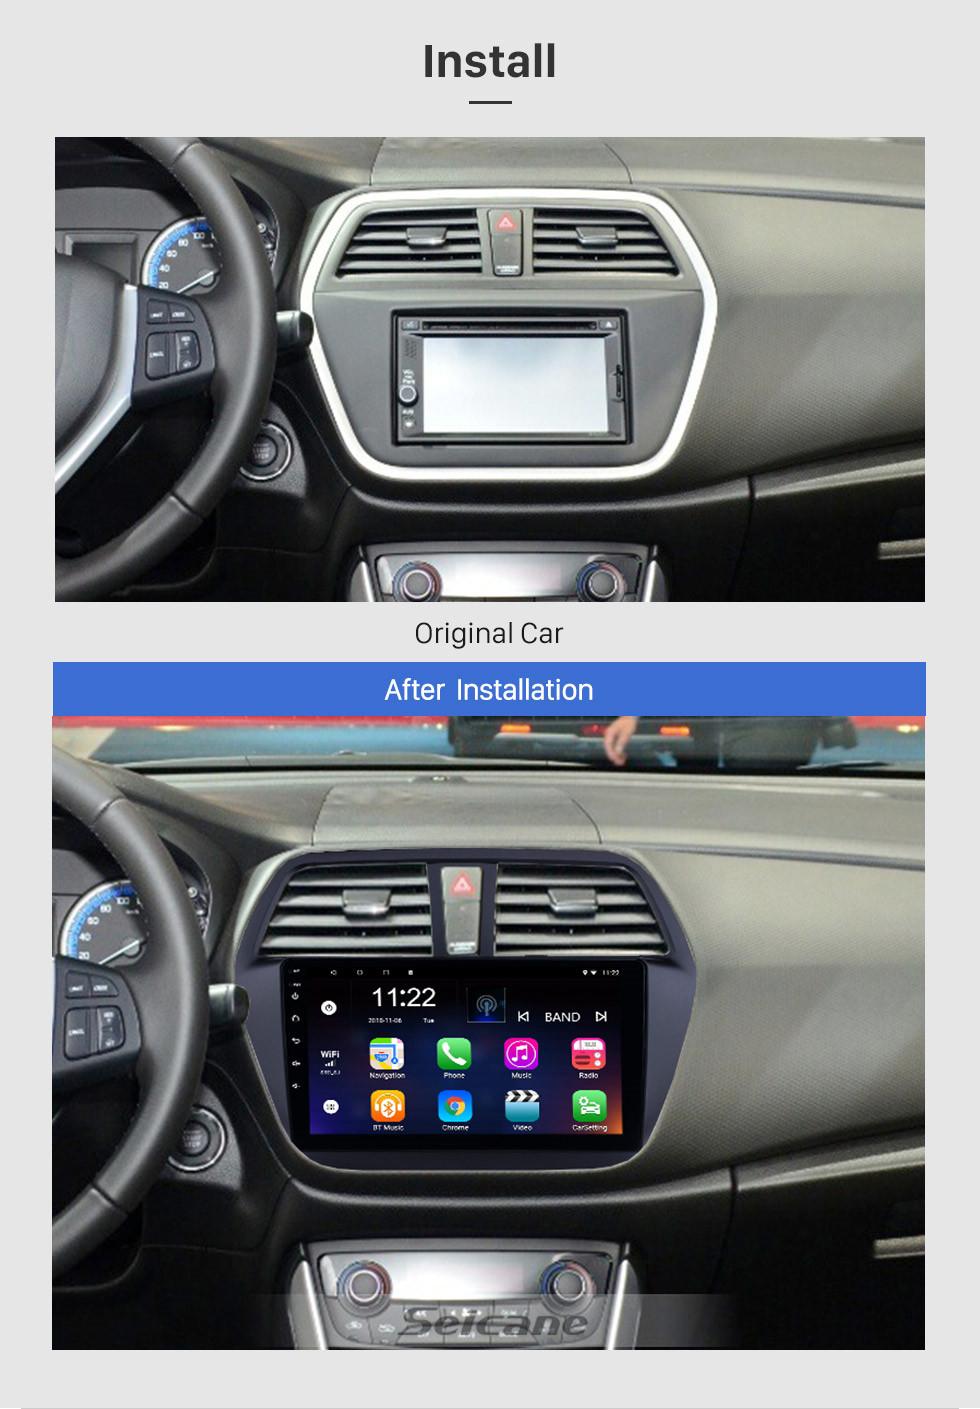 Seicane Android 8.1 9 polegada 2014-2017 Suzuki S-Cross SX4 HD Touchscreen Rádio Navi GPS Bluetooth suporte OBD2 DVR 3G WIFI SWC TPMS